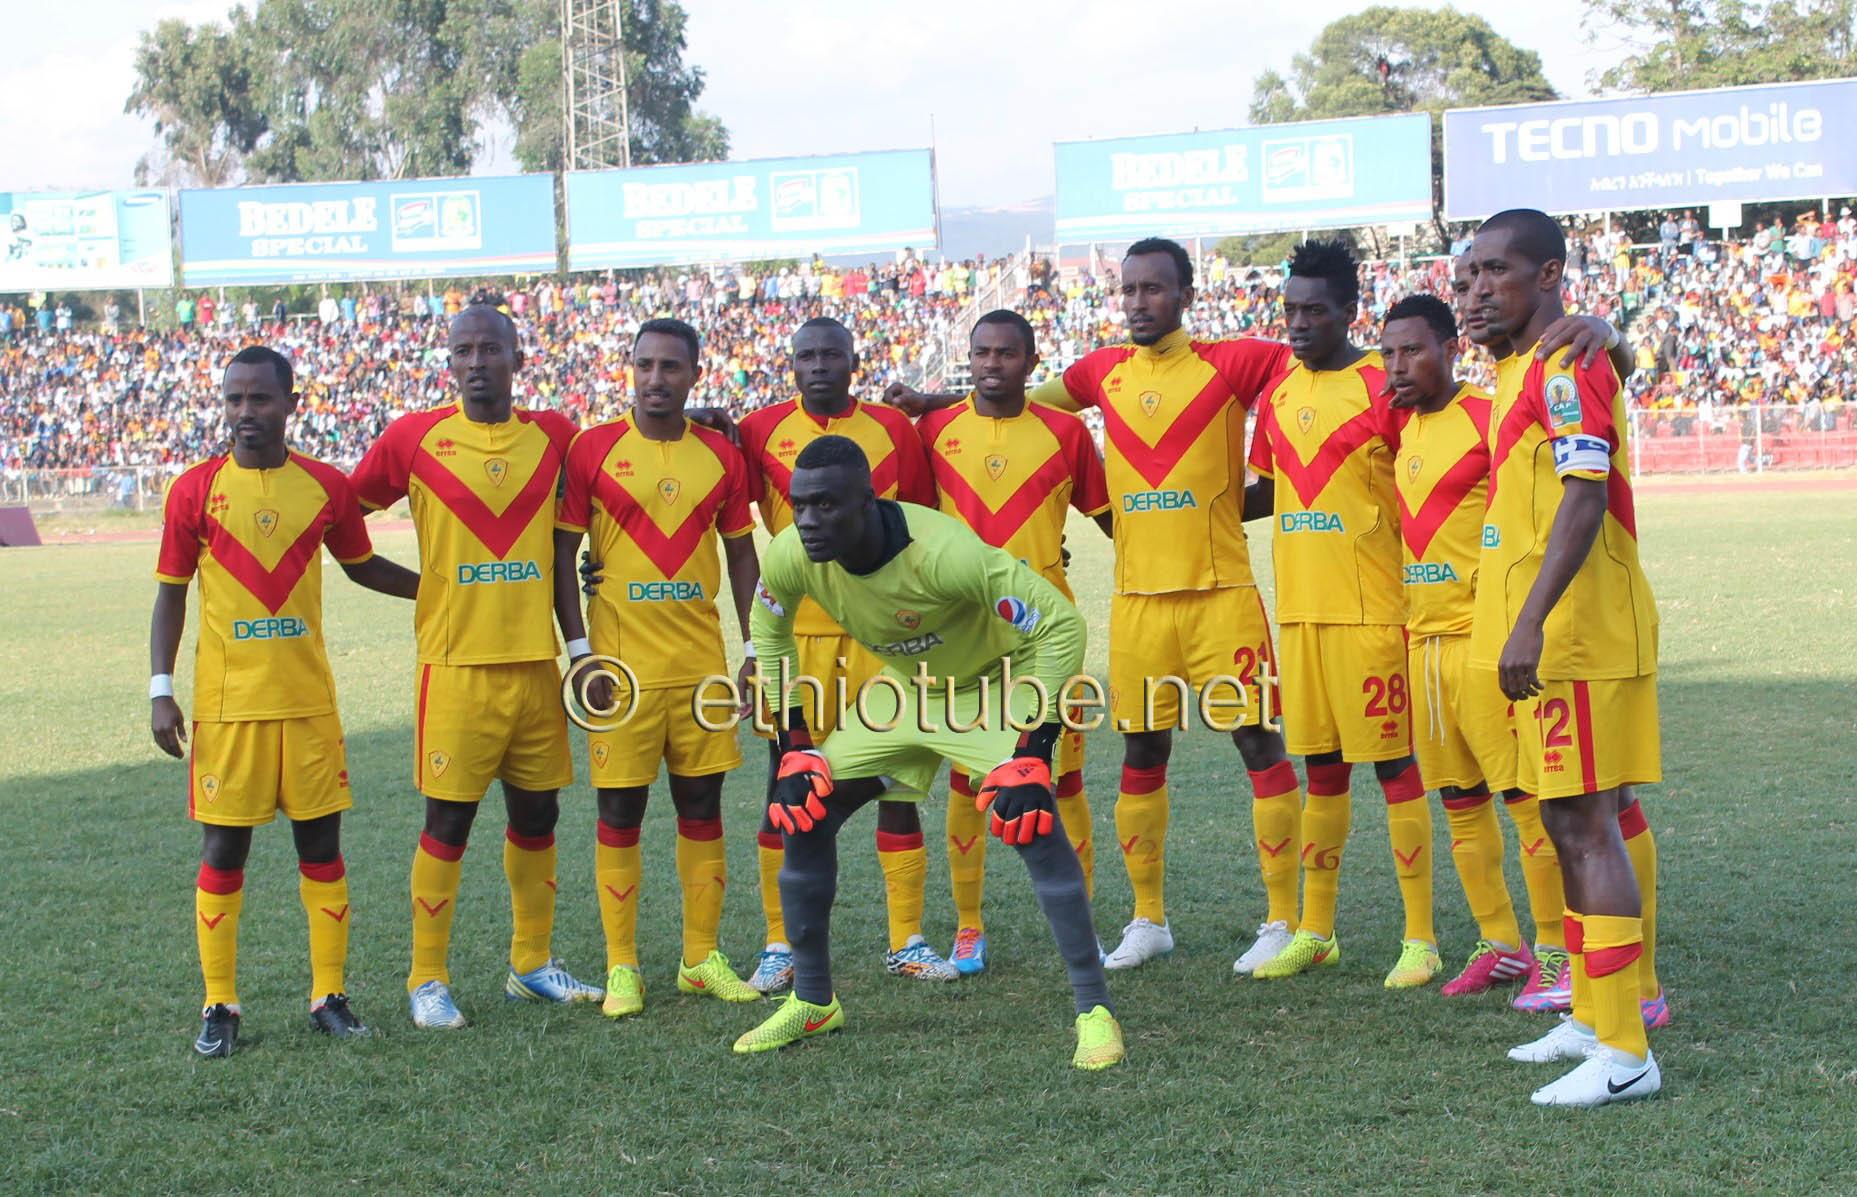 St. George best 11 against Ethio Coffee